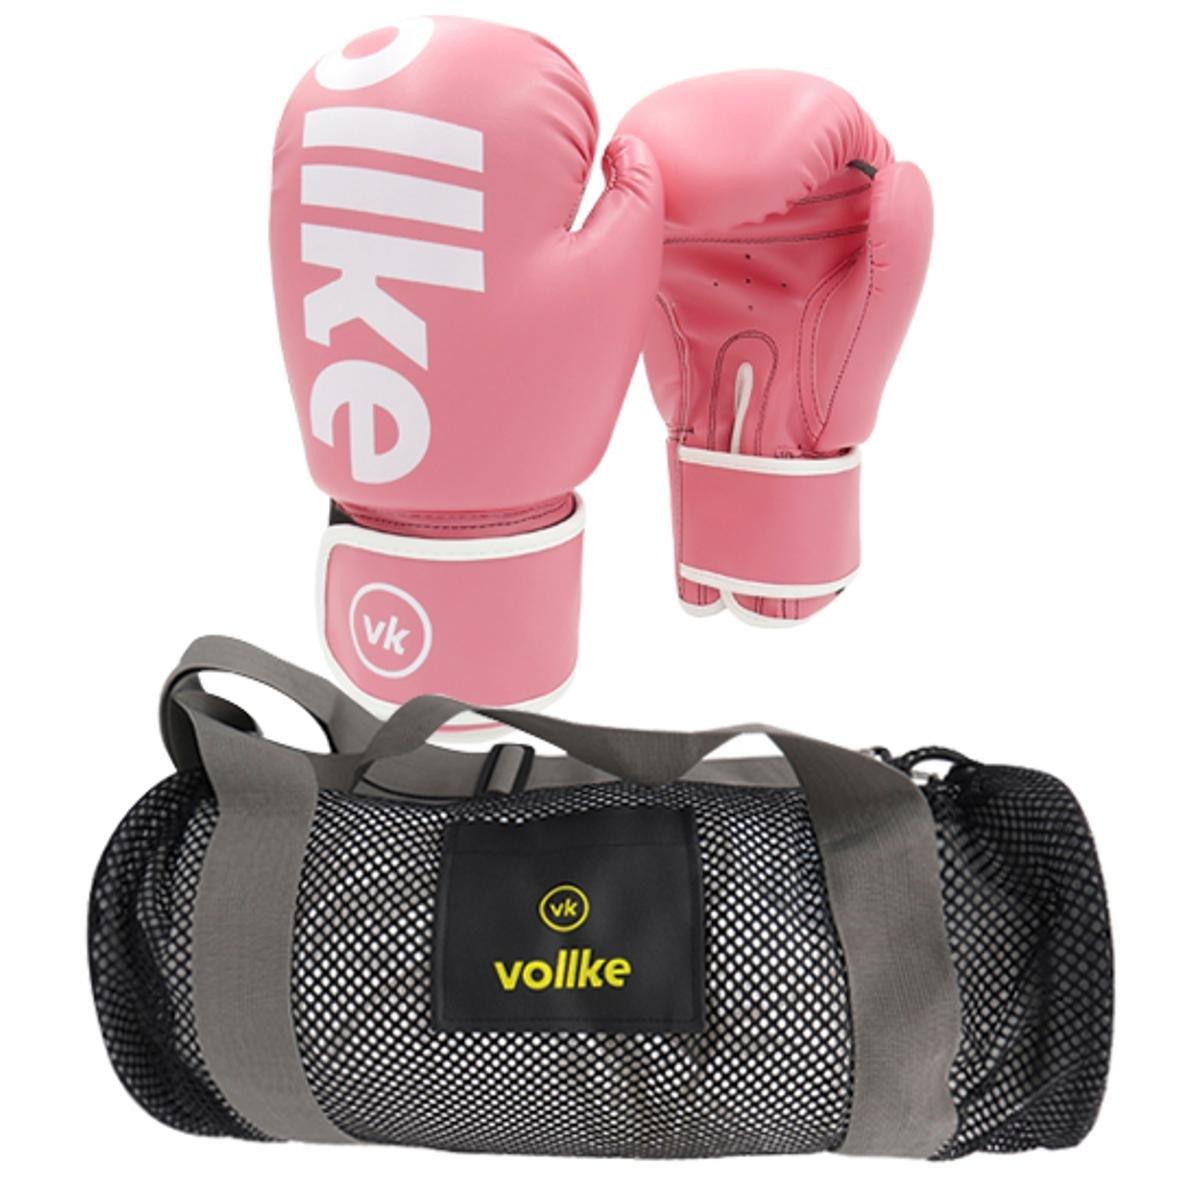 ee8ac36ce Kit Feminino Vollke Luva Muay Thai 4Ladies 12OZ e Bolsa Gym Mesh - Compre  Agora